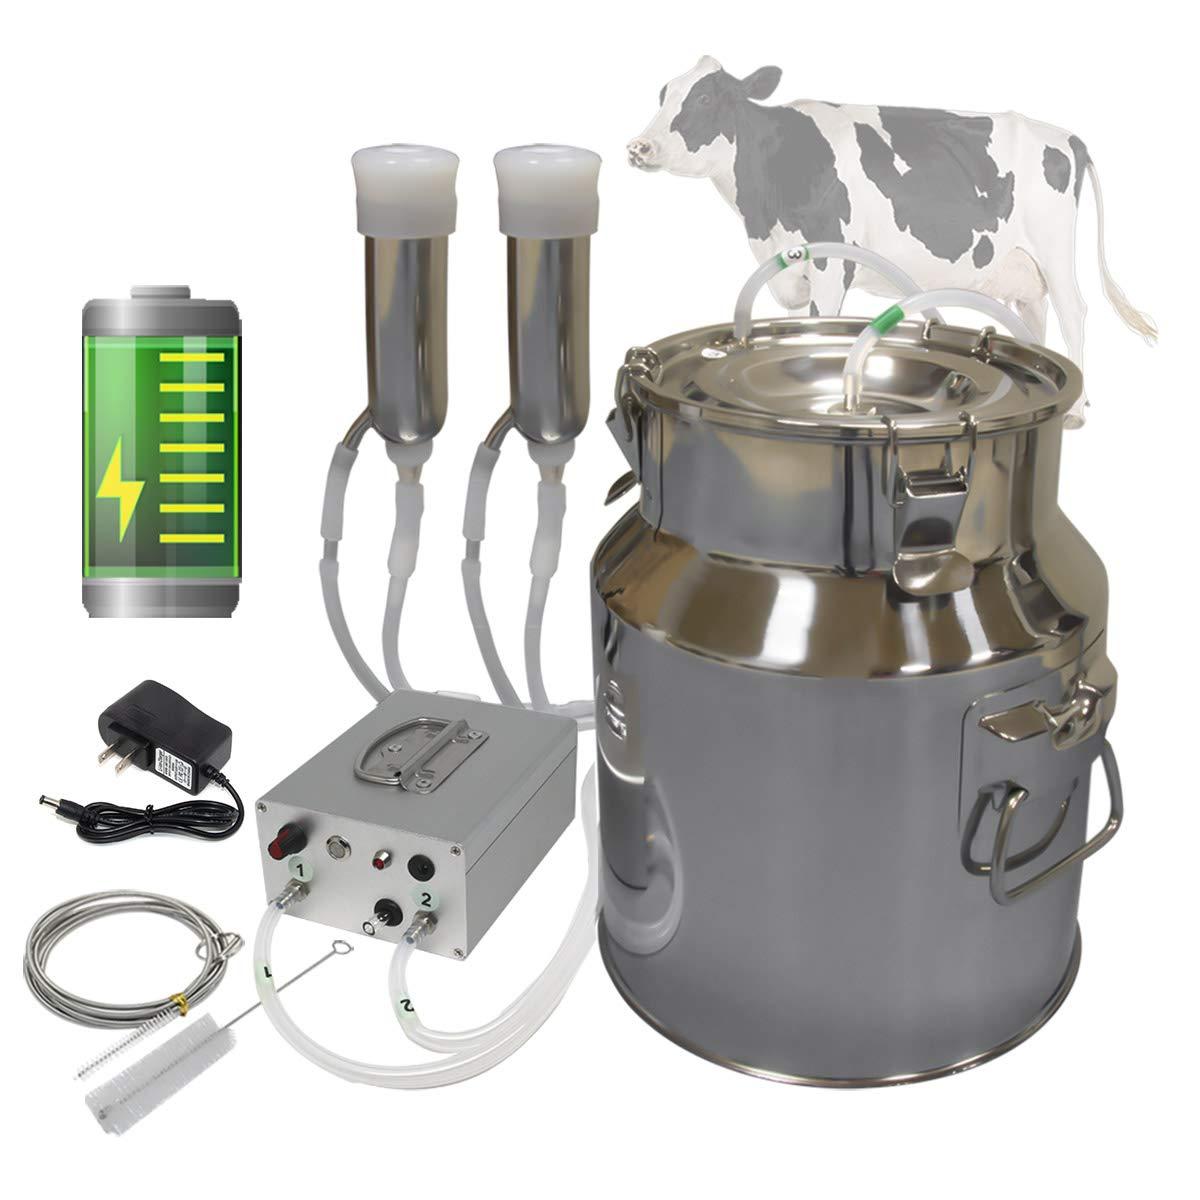 Hantop 14L Cow Ranking TOP19 Super sale Milking Machine Po Rechargeable Portable Battery